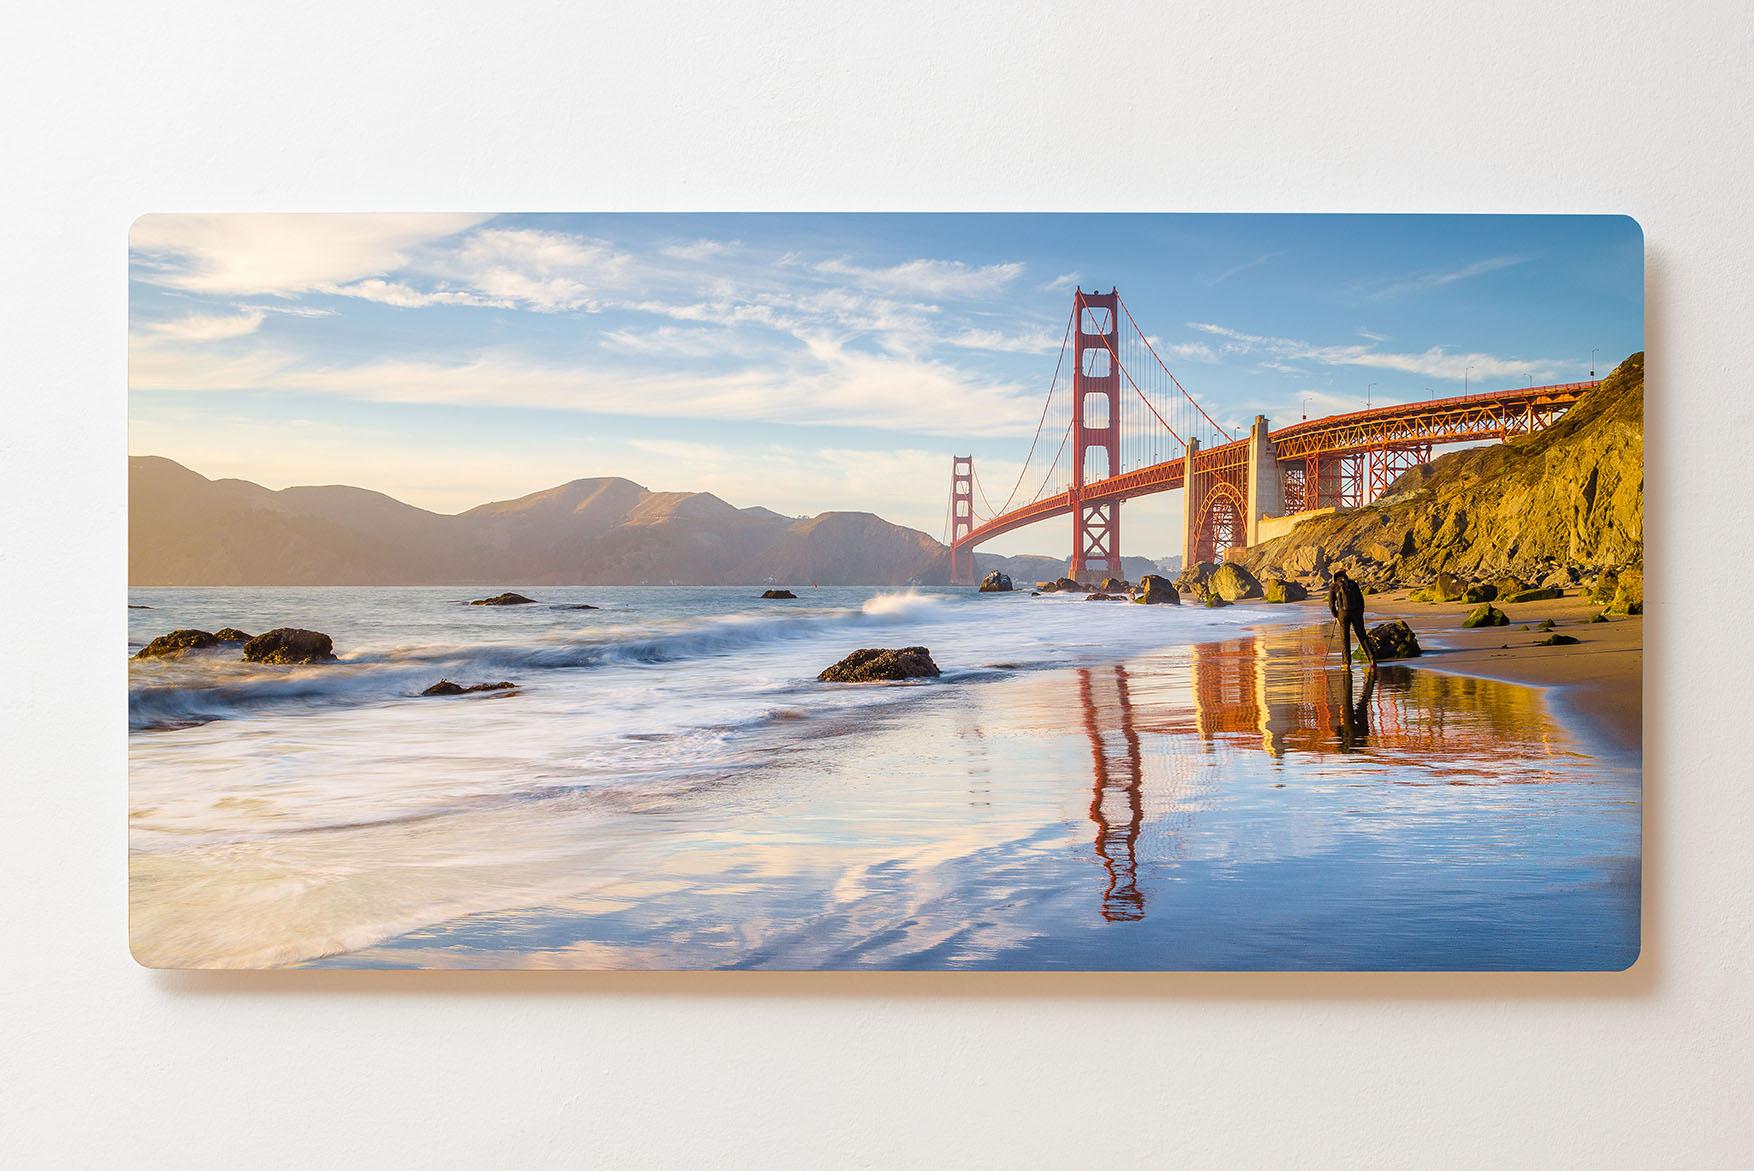 Magnettafel BACKLIGHT 120x60cm Motiv-Wandbild M155 Golden Gate San Francisco